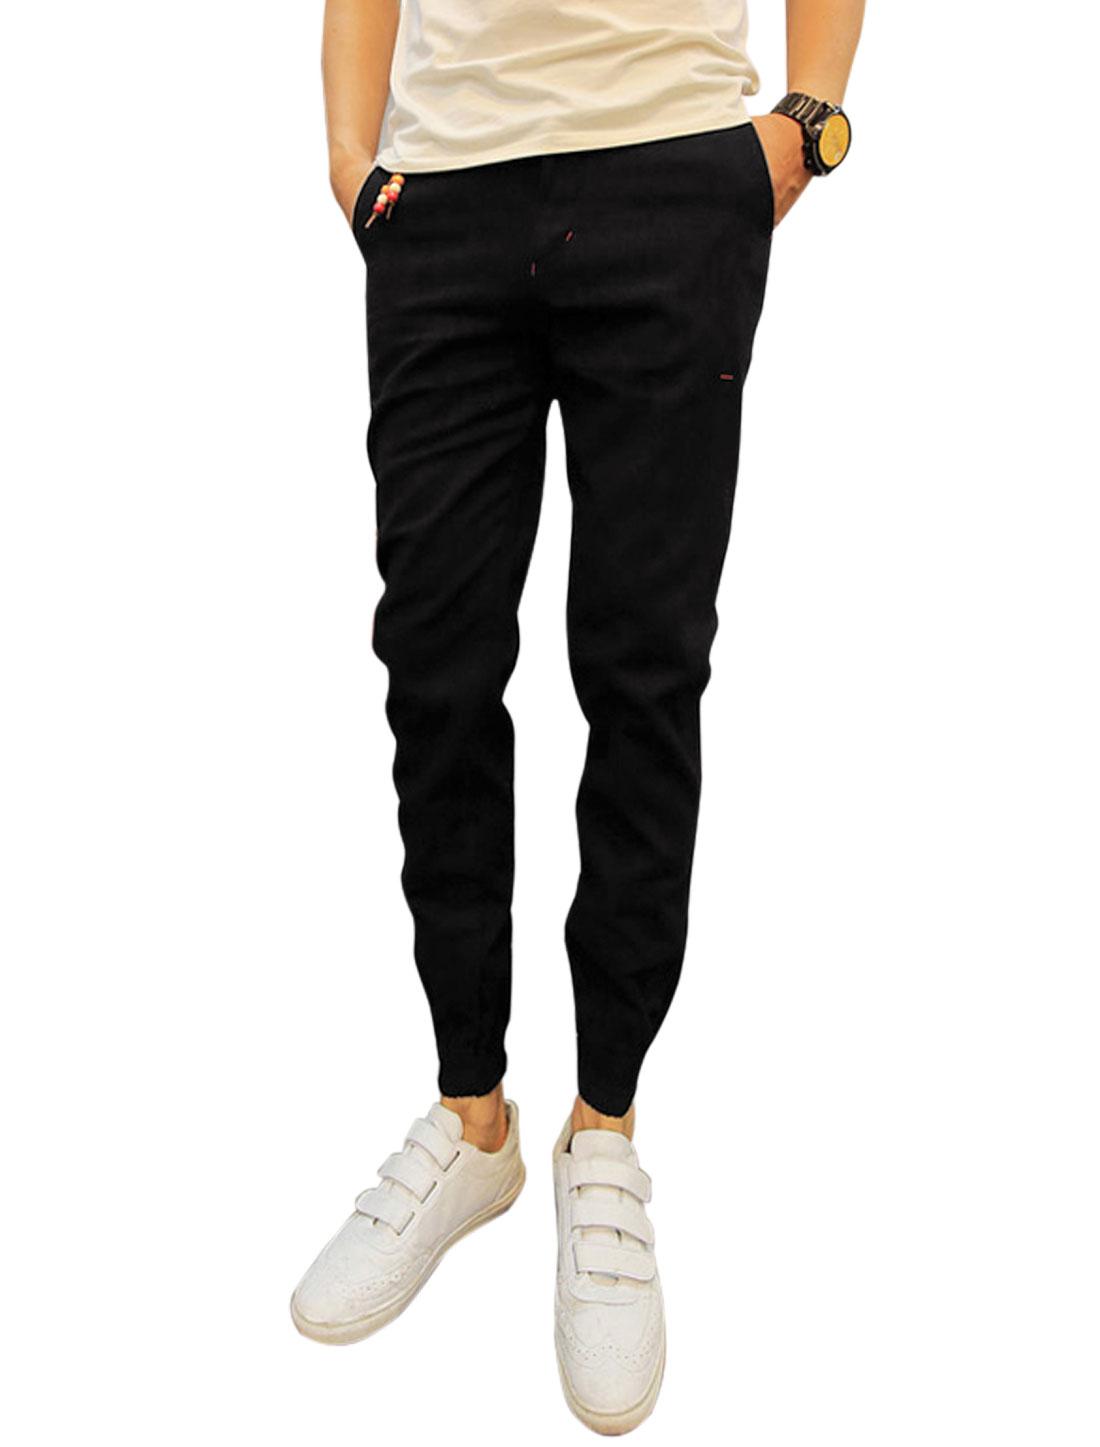 Men Belt Loop Pockets Elastic Cuffs Leisure Pants Black W30